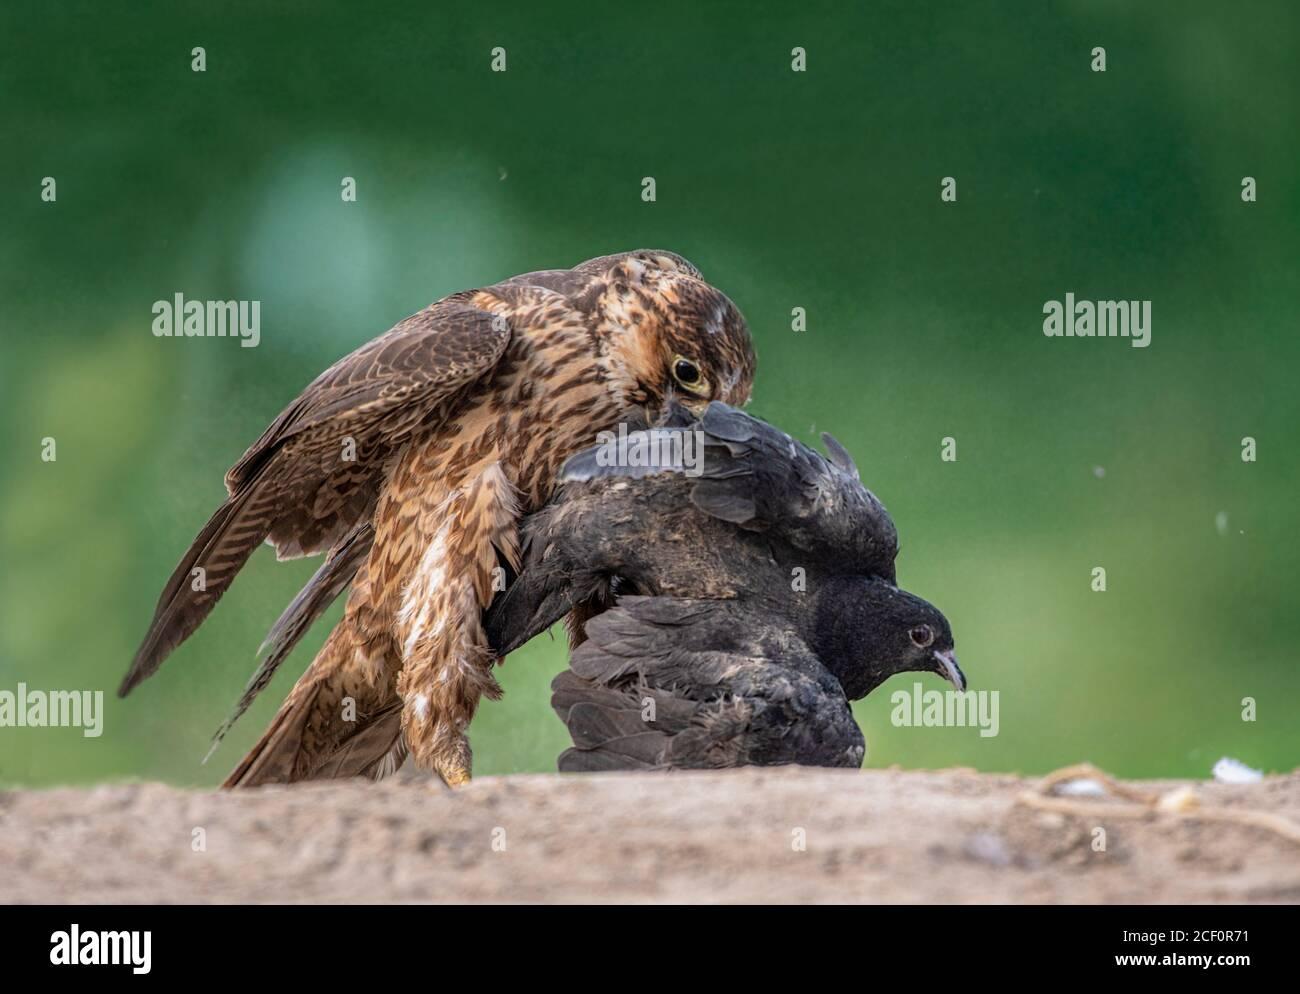 Cometa, shikra, halcón, águila, águila, águila, águila, kestrel y otras aves de presa en Pakistán Foto de stock